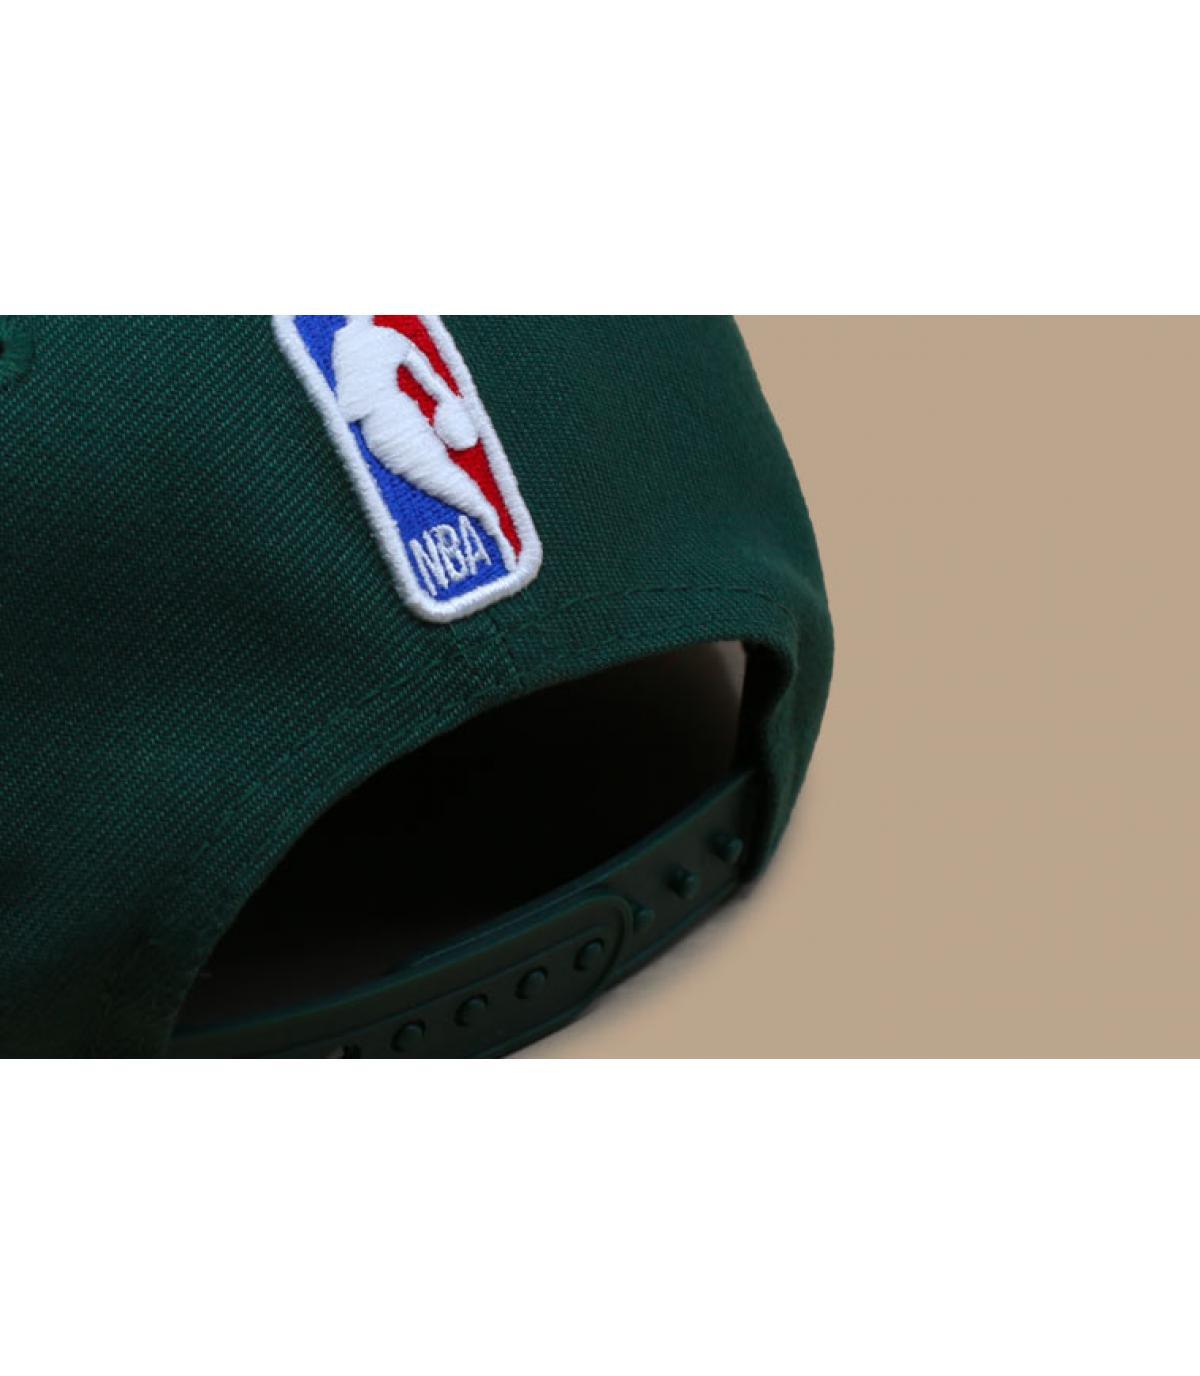 Détails Snapback NBA Draft Bucks 950 - image 5